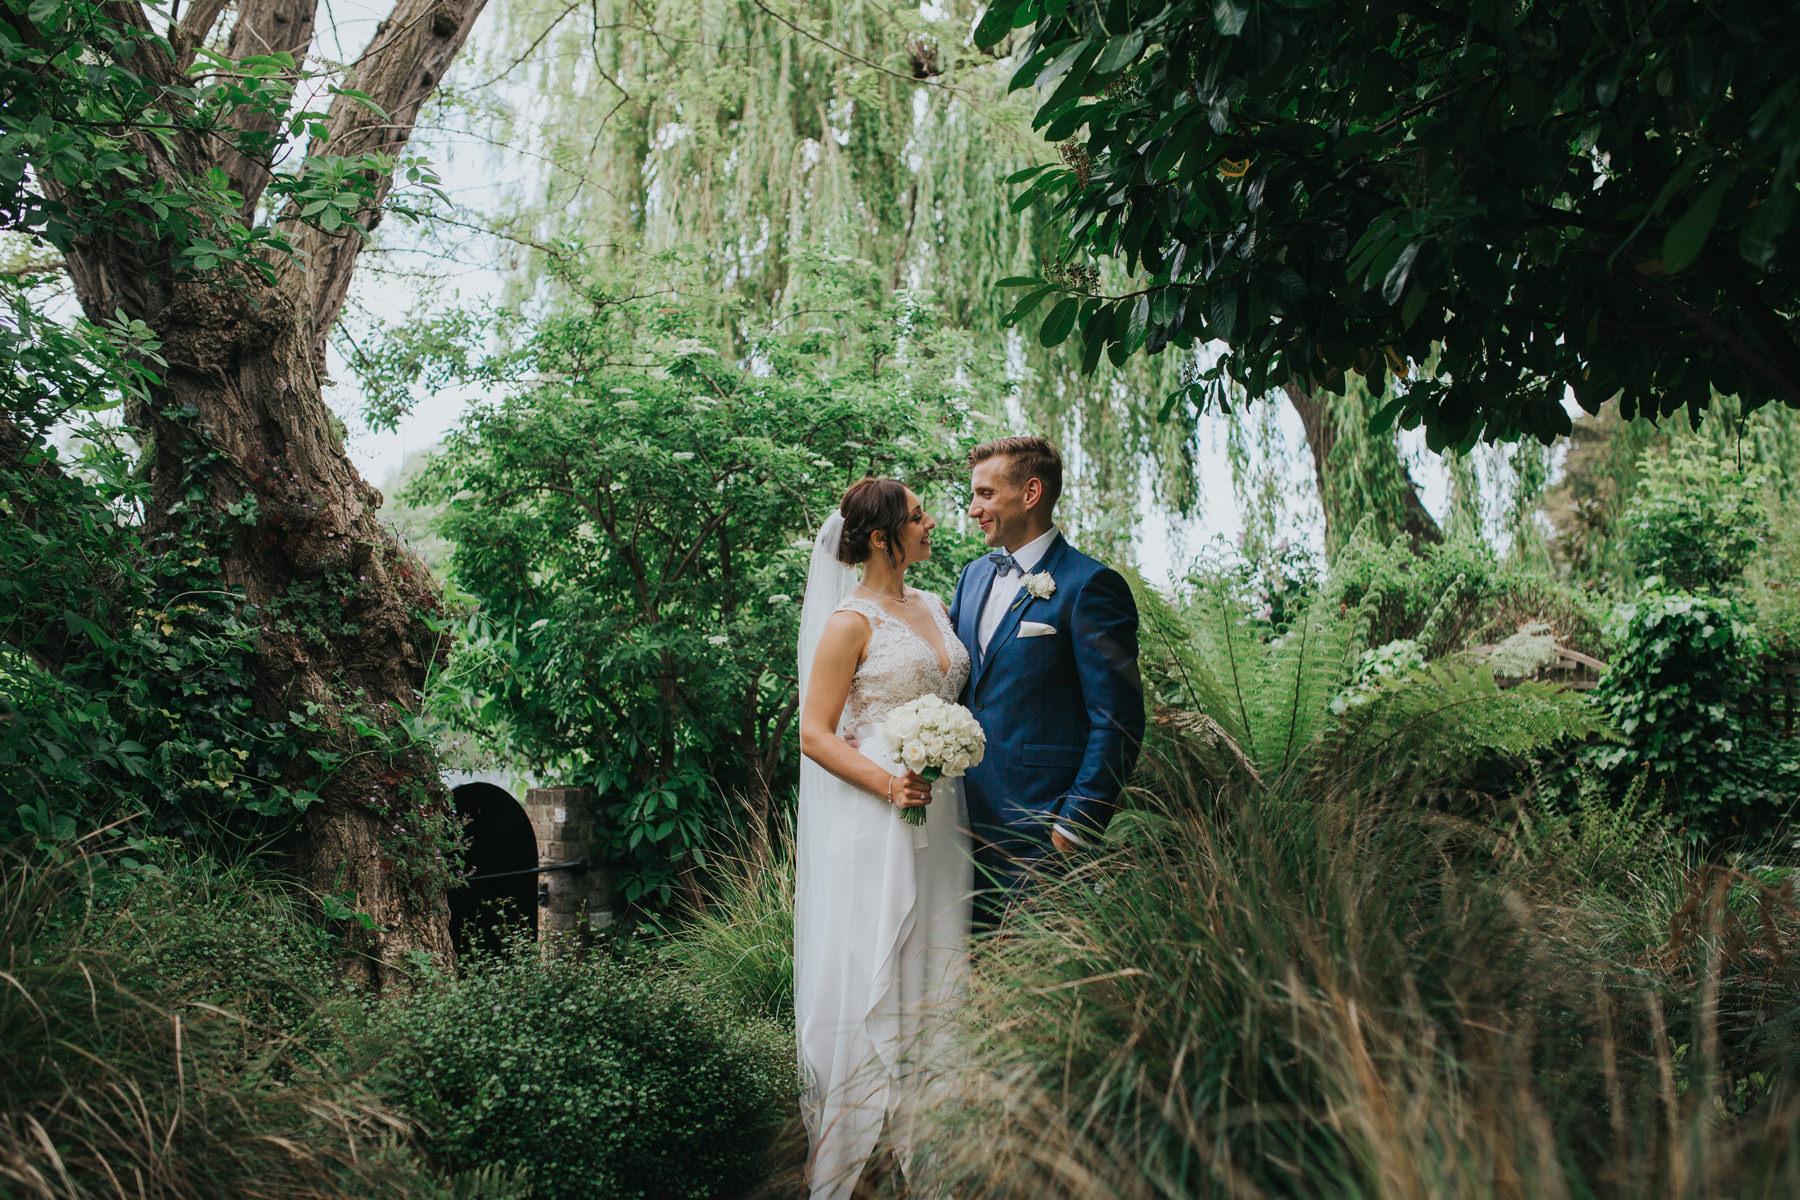 CRL-330-The Bingham wedding Richmond-Claire Rob bridal couple portraits.jpg